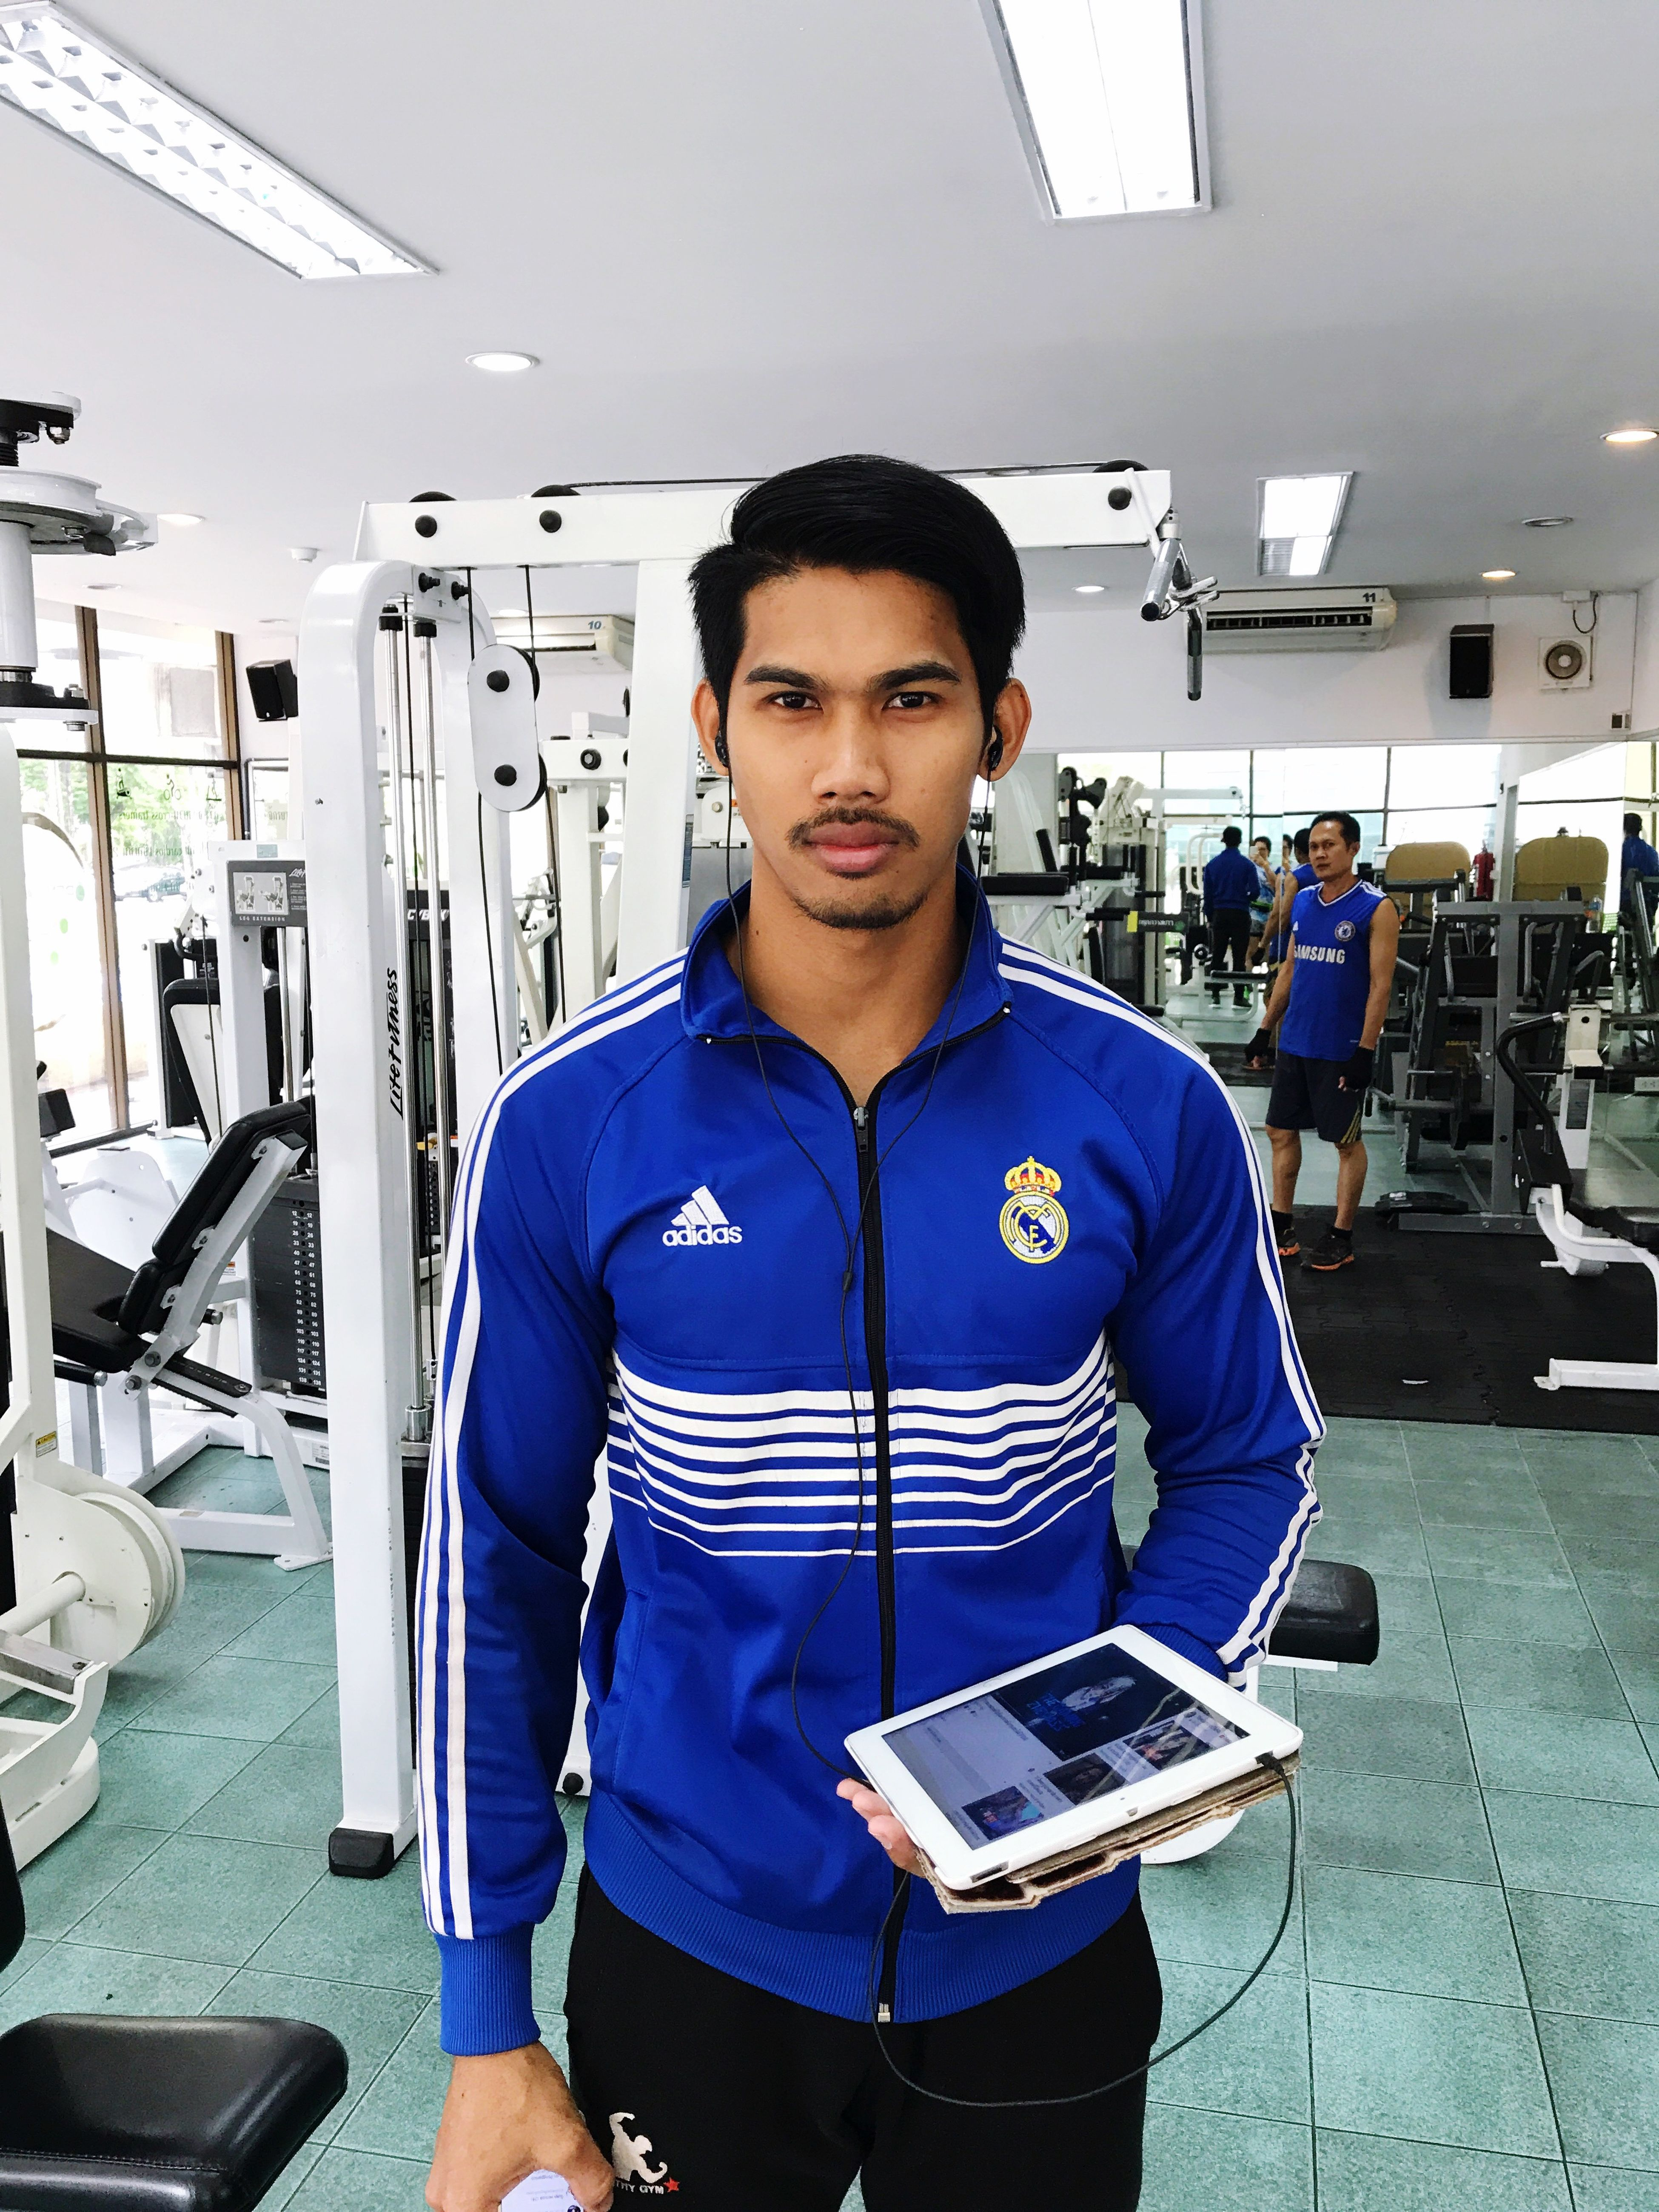 My Trainer เทรนเนอร์พี่สั่งให้ไปกินพิซซ่า กะ แม็คนั่ม!! 😍💋 สวรรค์ !! Personal Trainer Fit Factory Fitness Fitness Training Fitnesslifestyle  Fitness Model